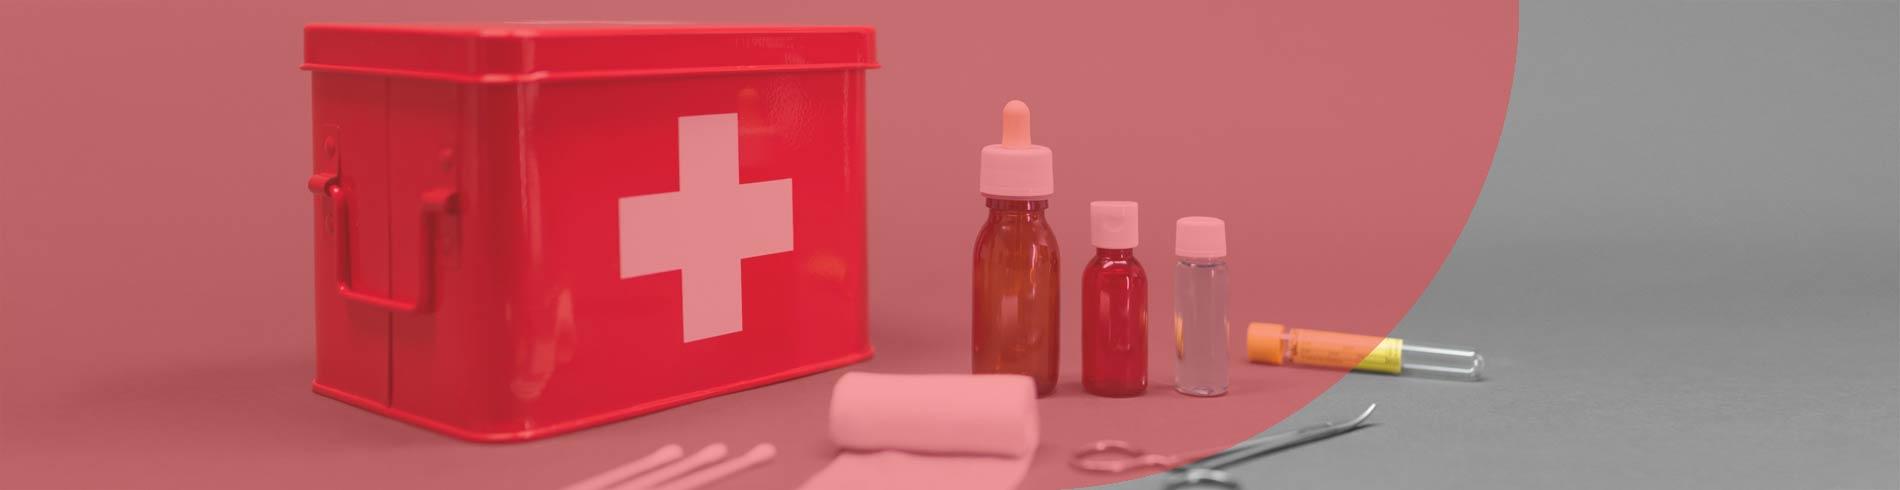 assegurances de salut